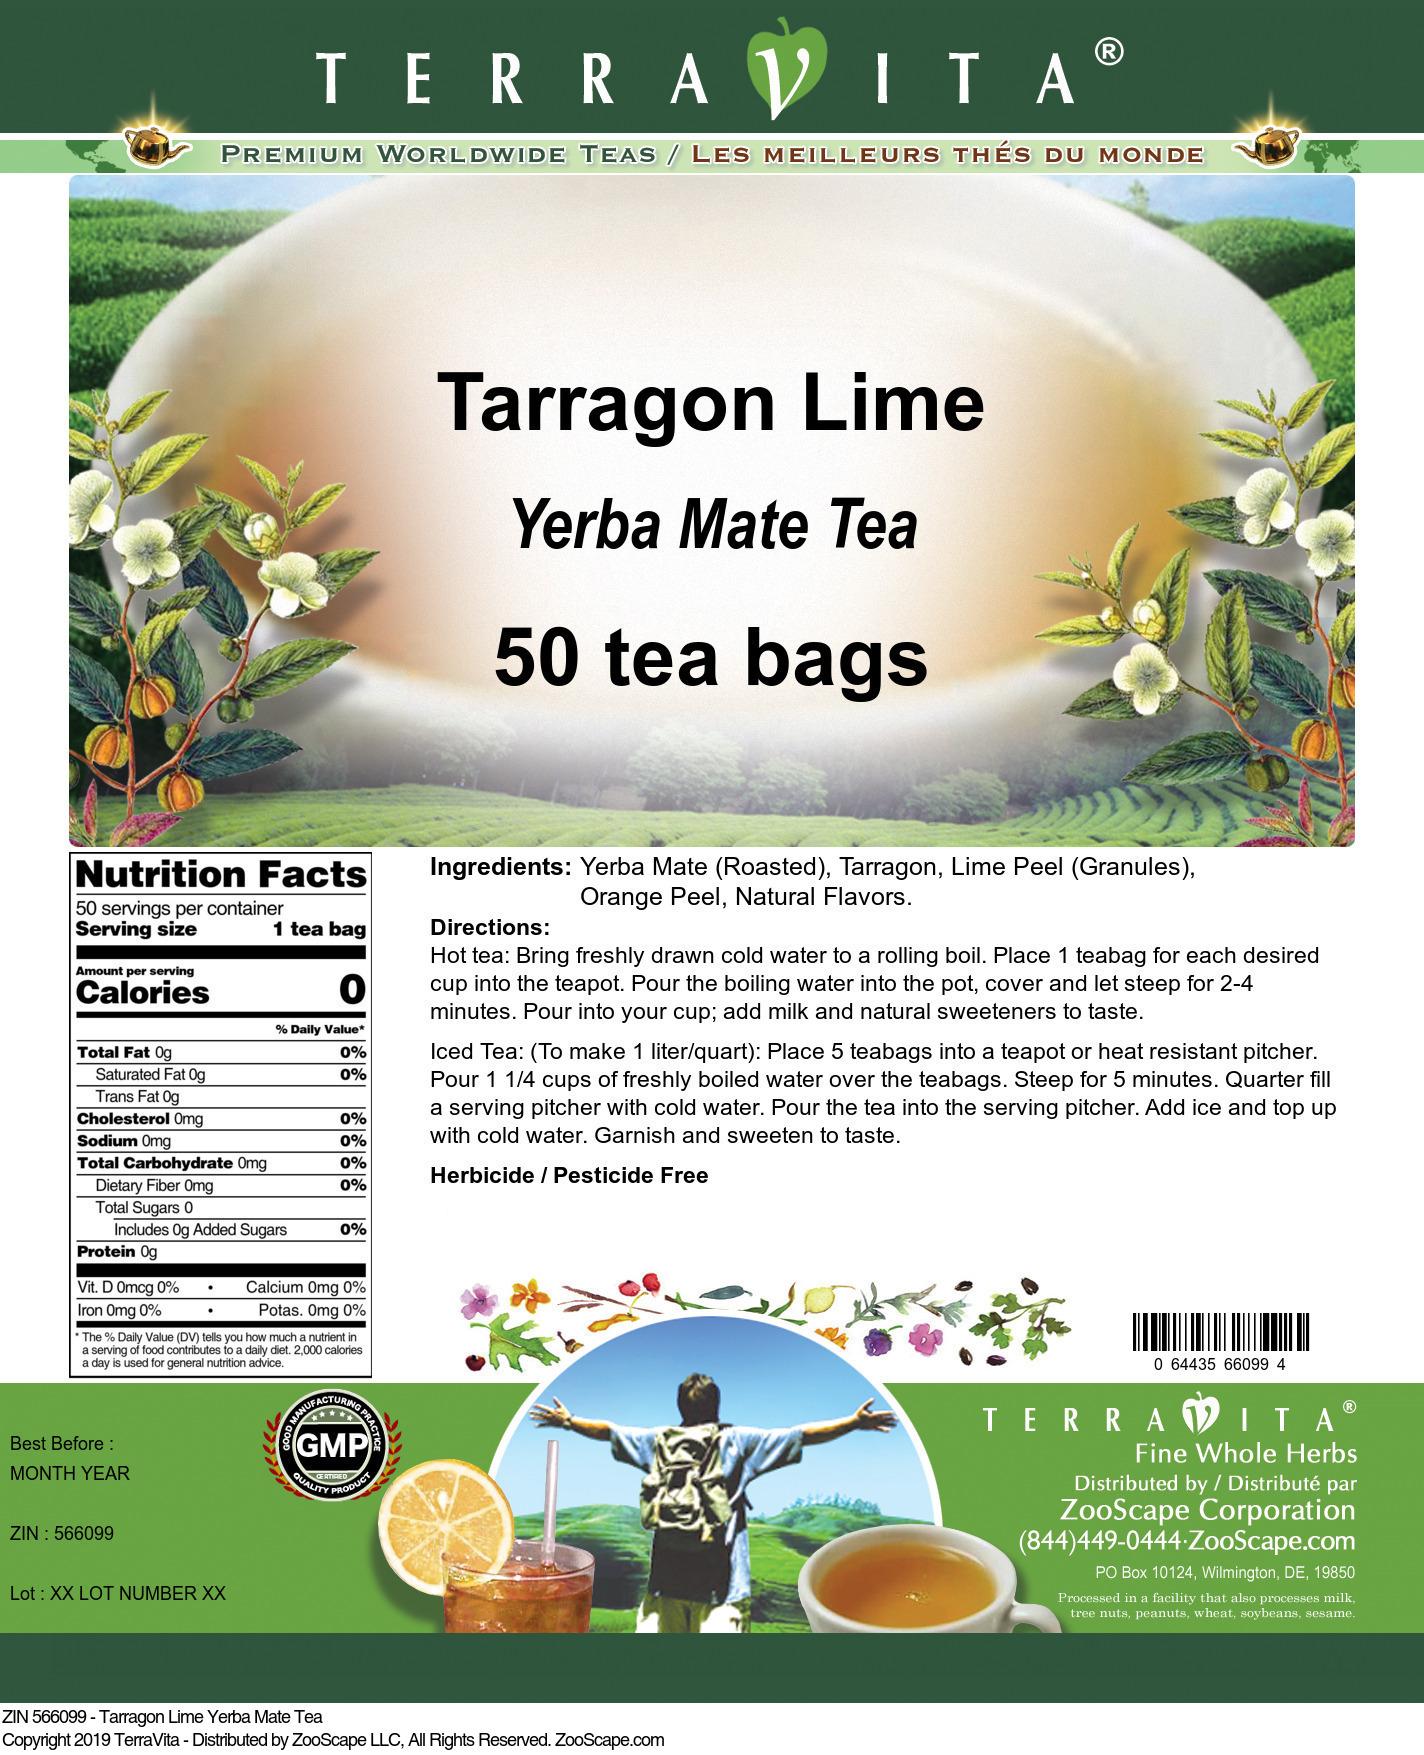 Tarragon Lime Yerba Mate